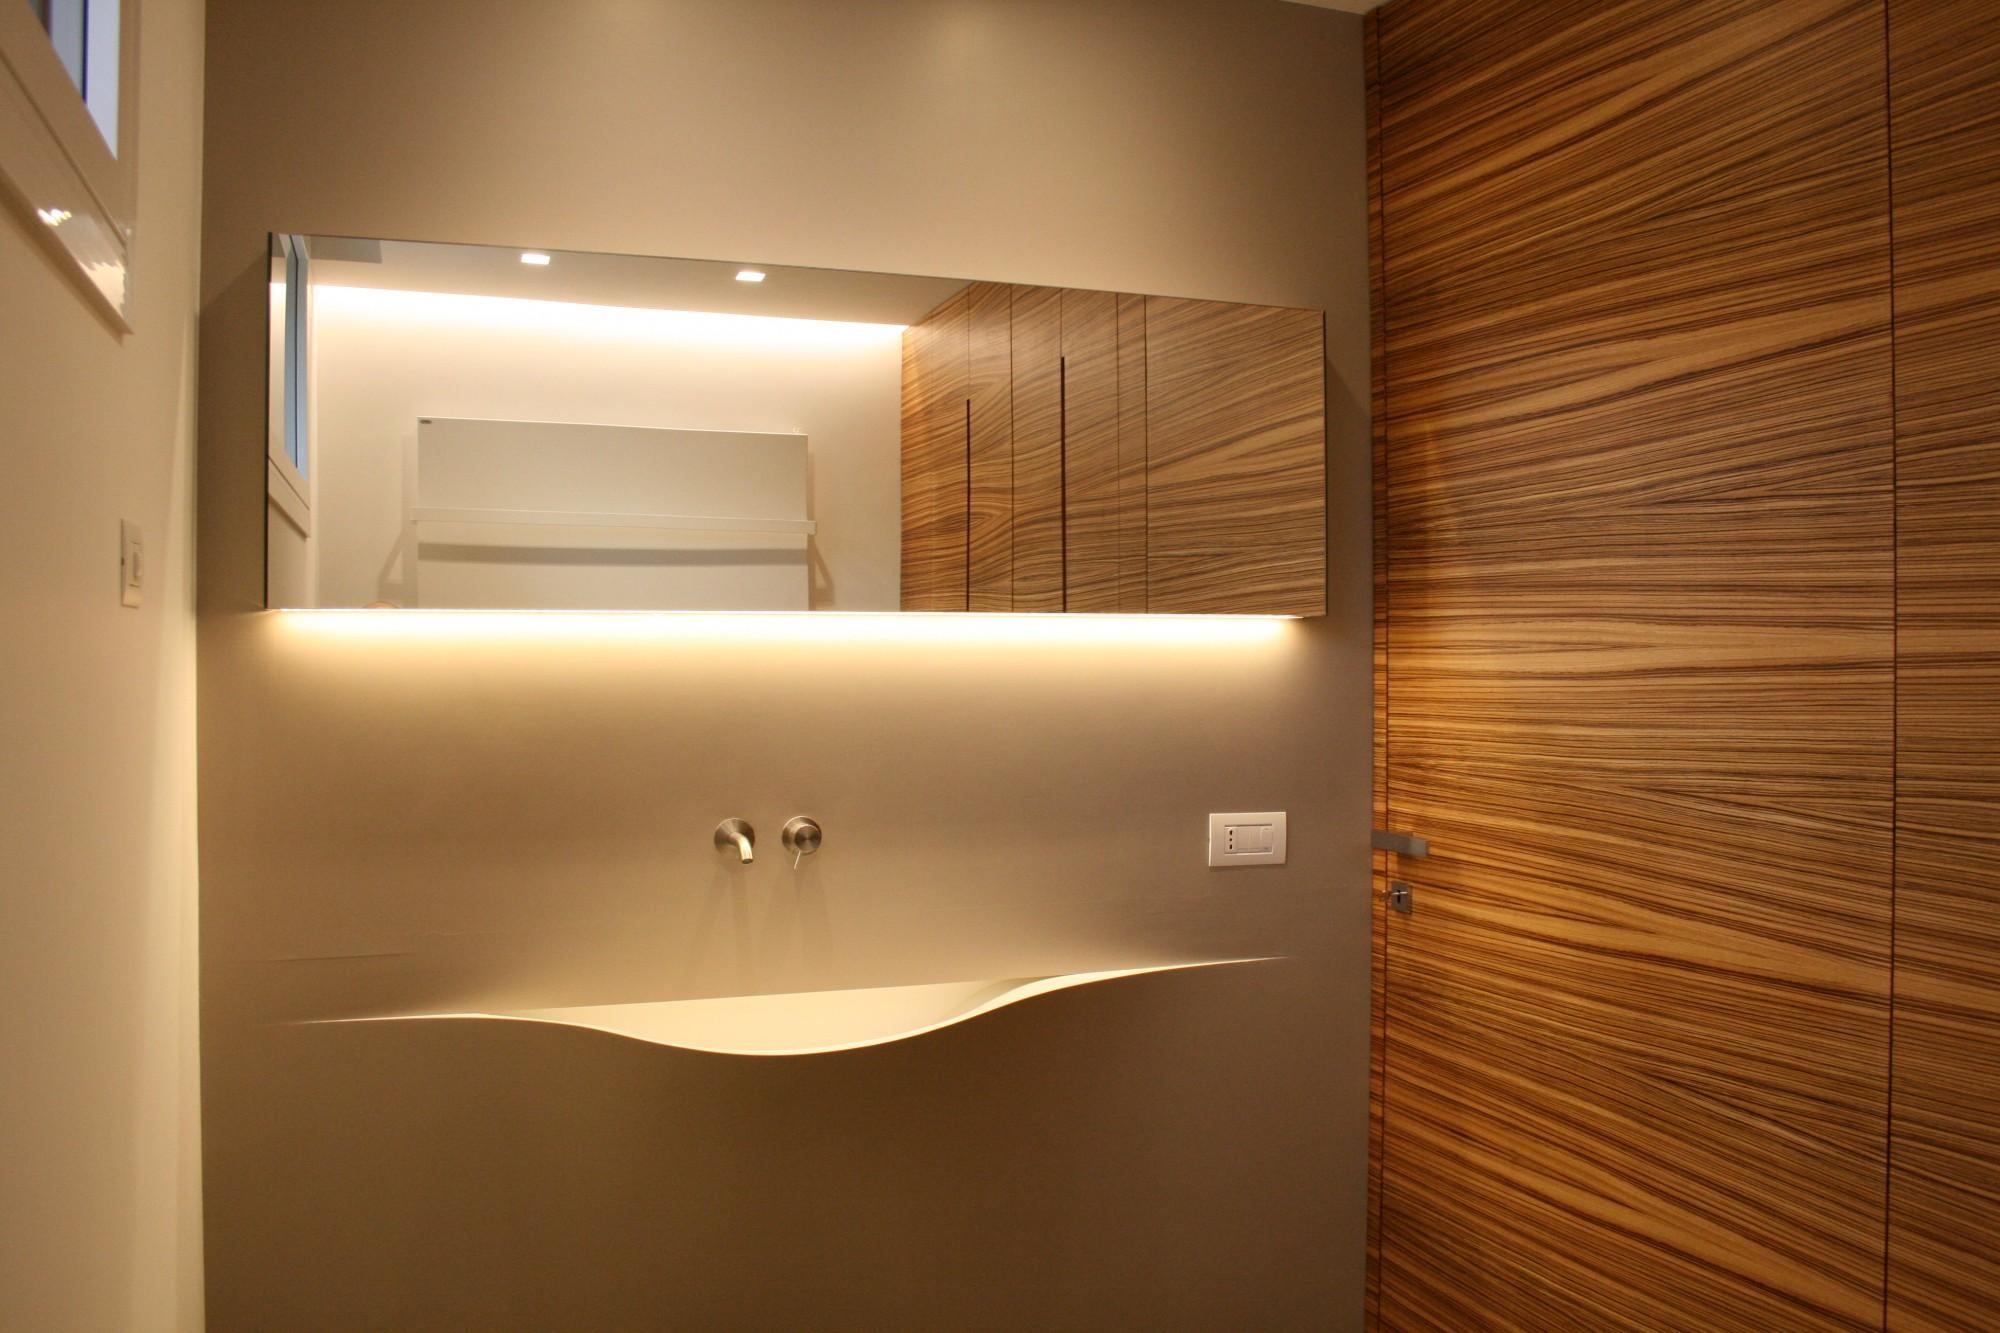 Arredo bagno moderno in zebrano a santarcangelo di romagna for Rami secchi da arredo